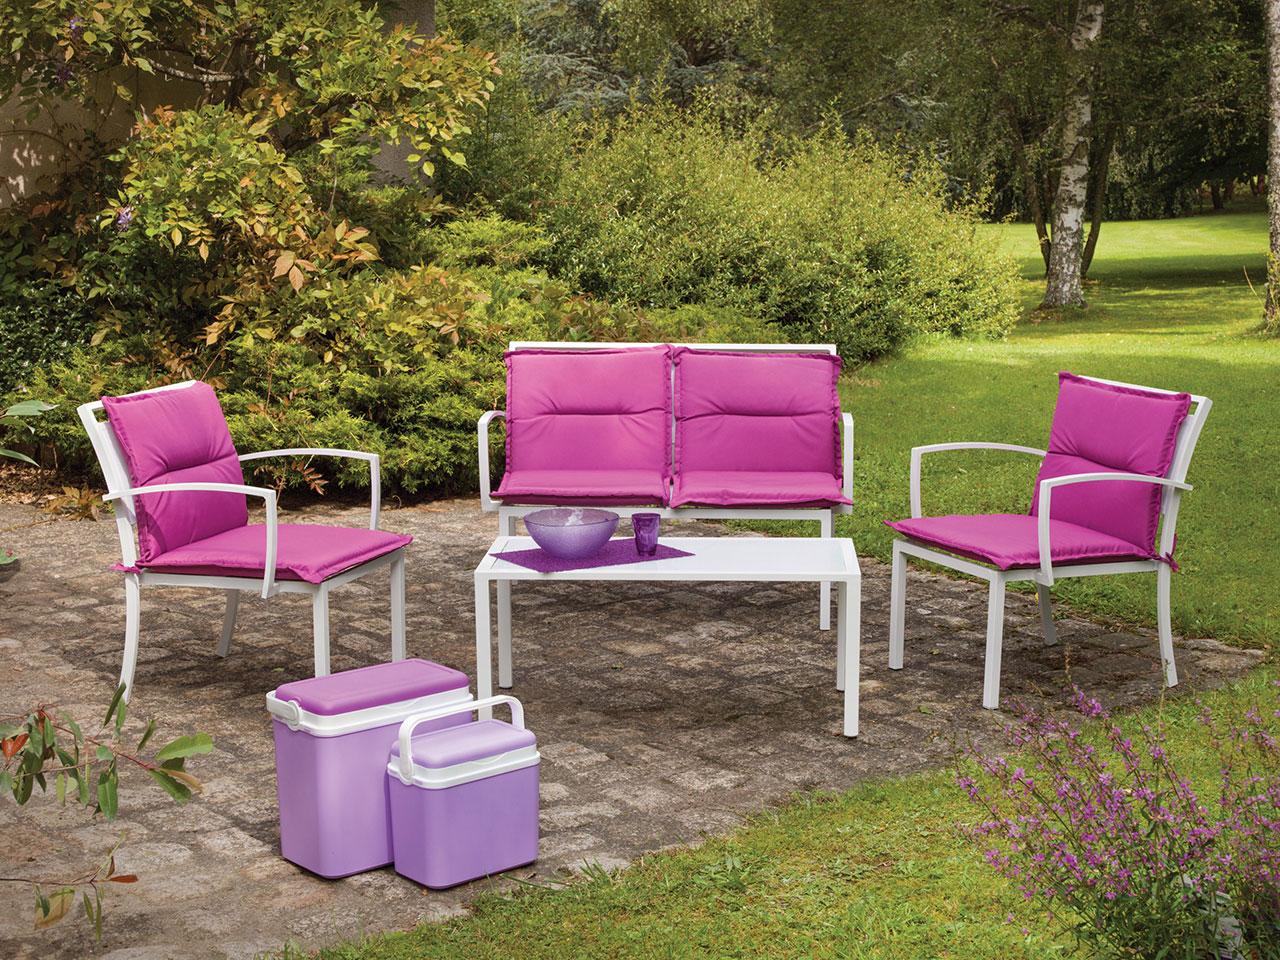 salon de jardin avec coussins fuchsia bleu. Black Bedroom Furniture Sets. Home Design Ideas